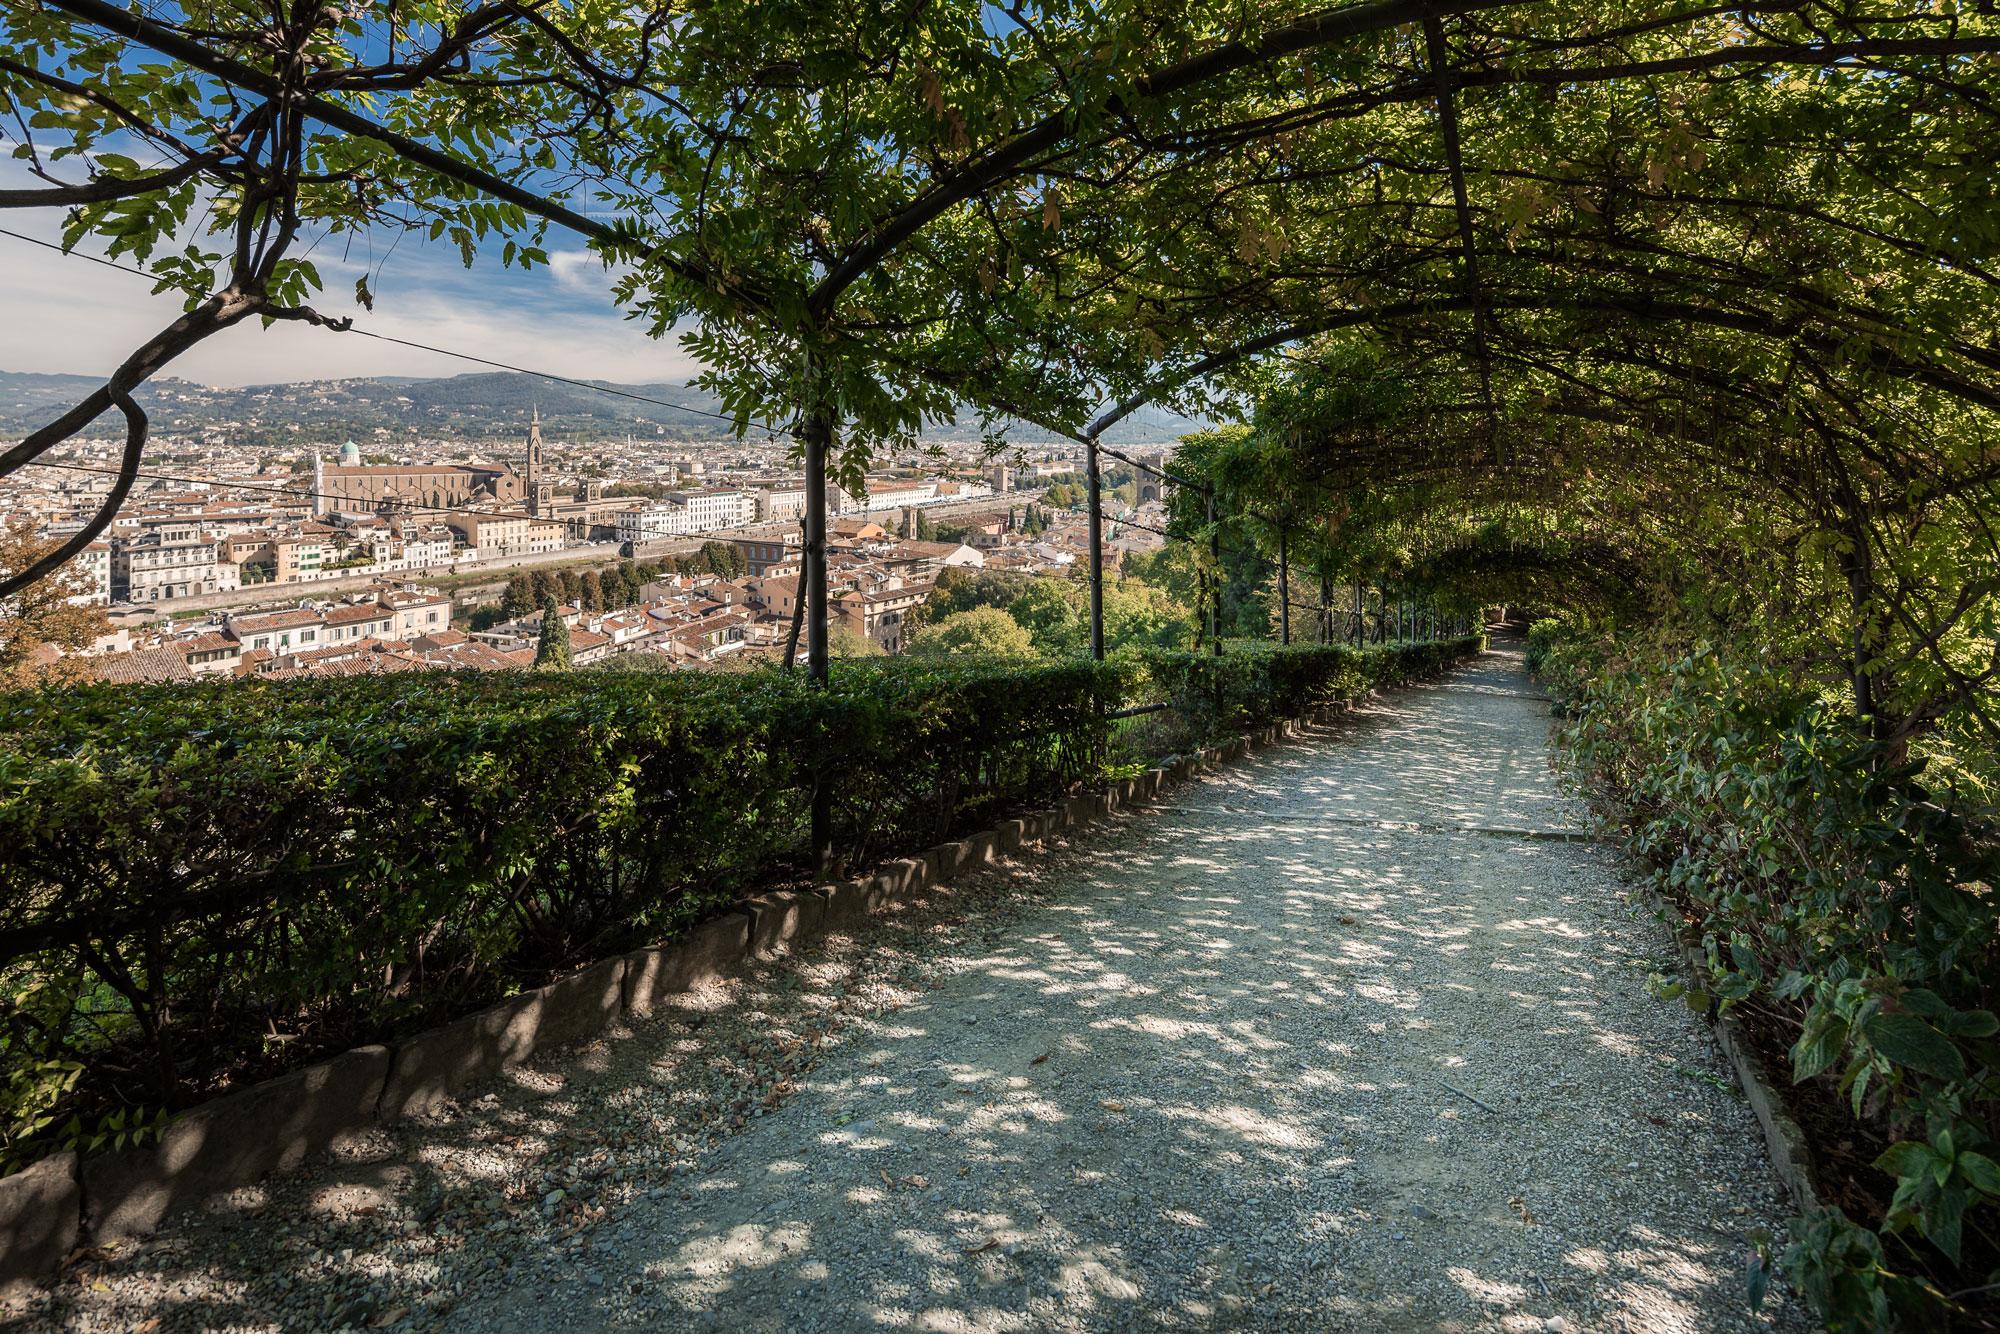 Villa bardini garden in florence Italy